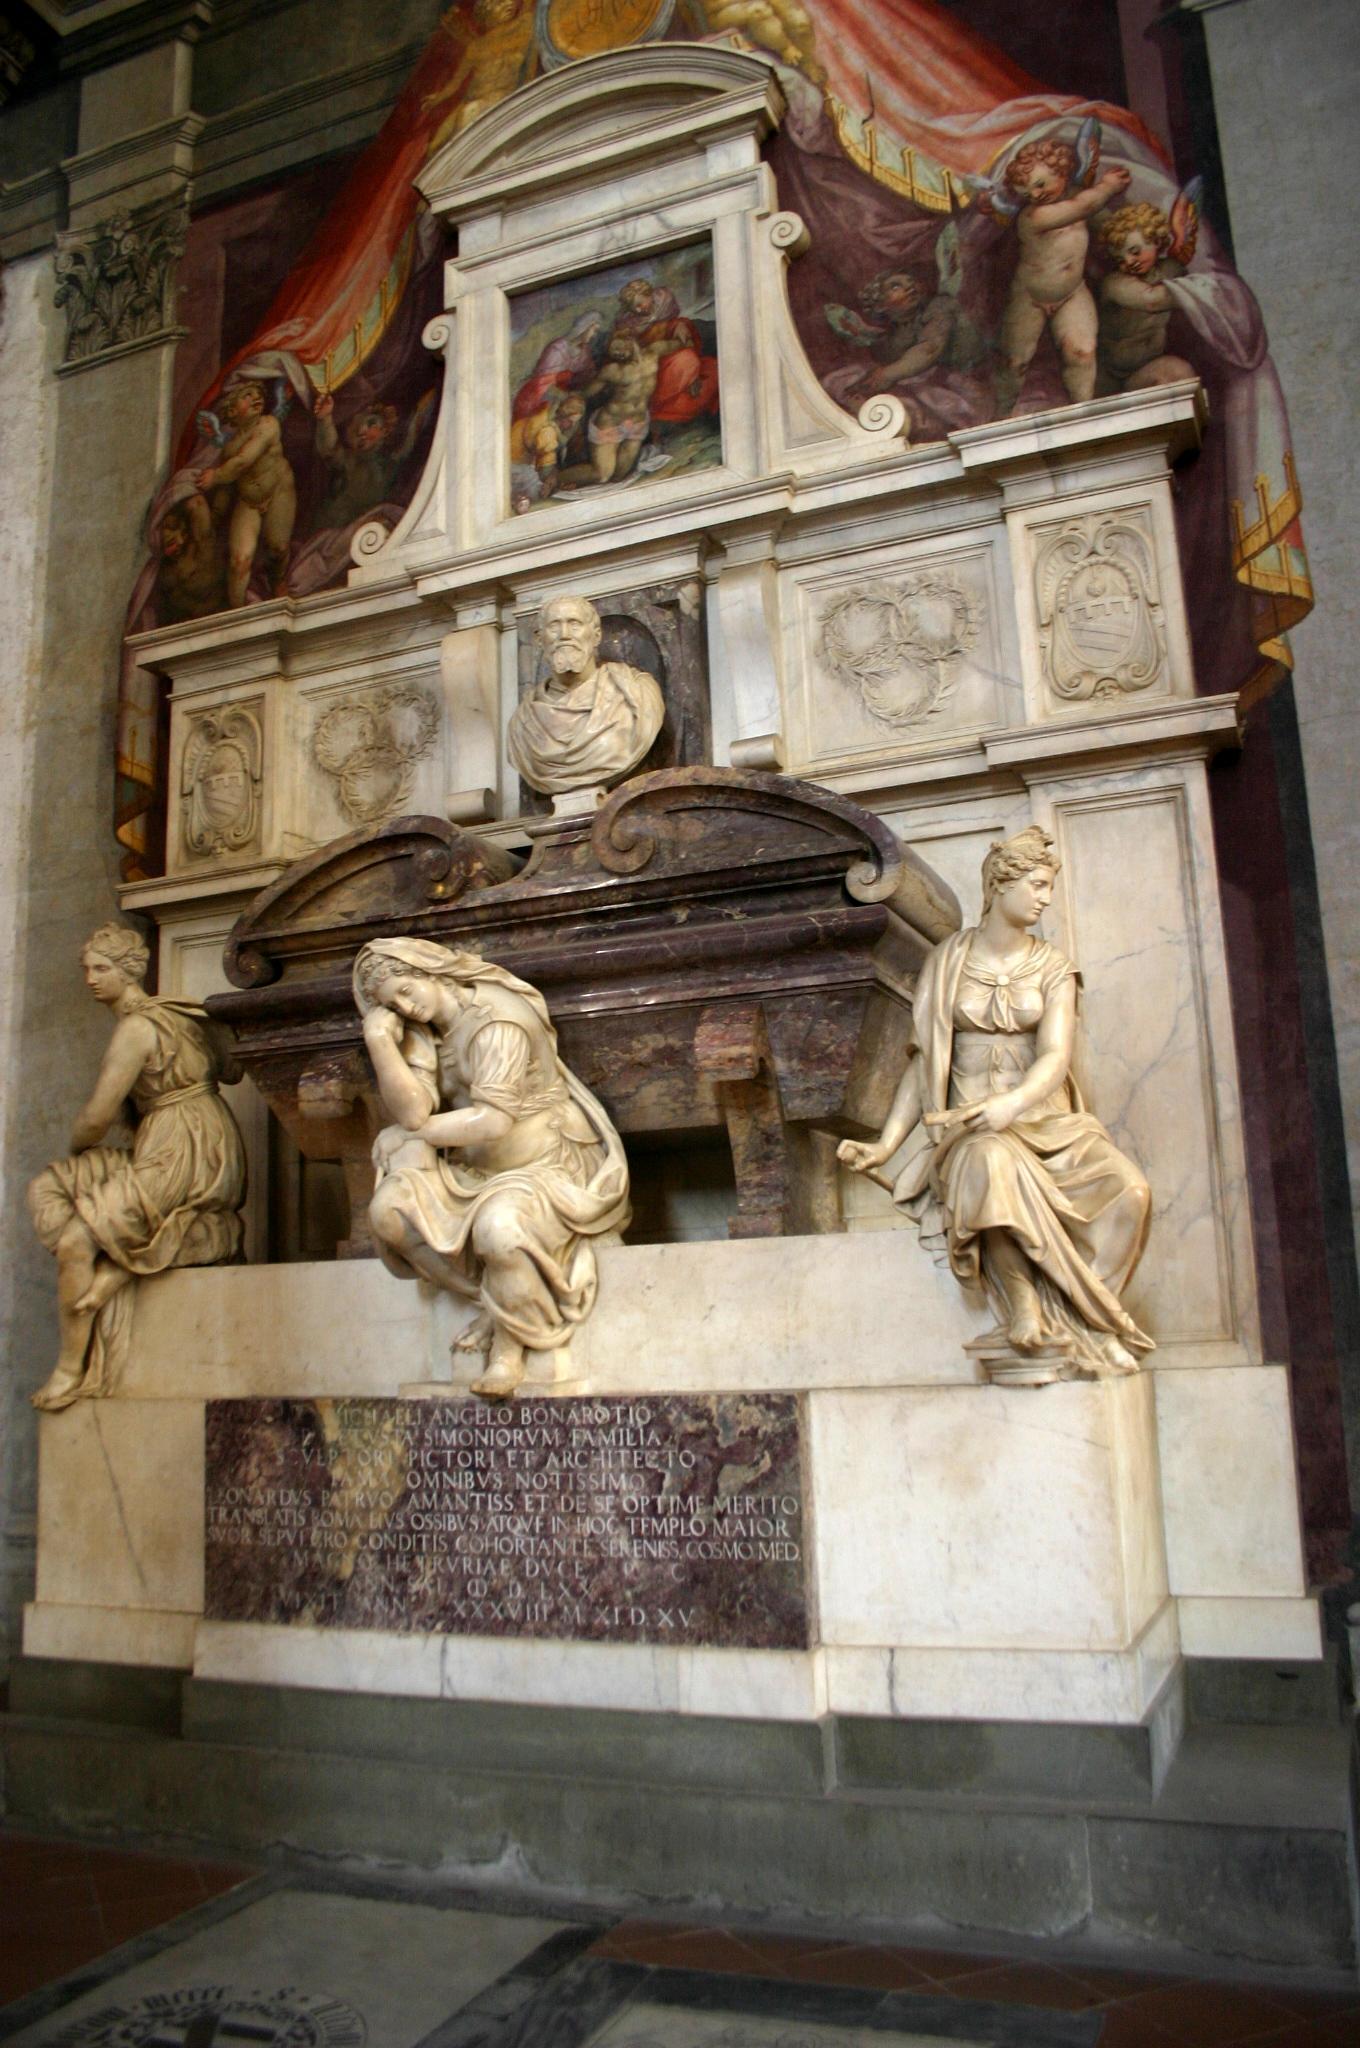 Giorgio Vasari, Nagrobek Michała Anioła w Bazylice Santa Croce we Florencji, 1564-1574. Fotografia: Giovanni dall'Orto